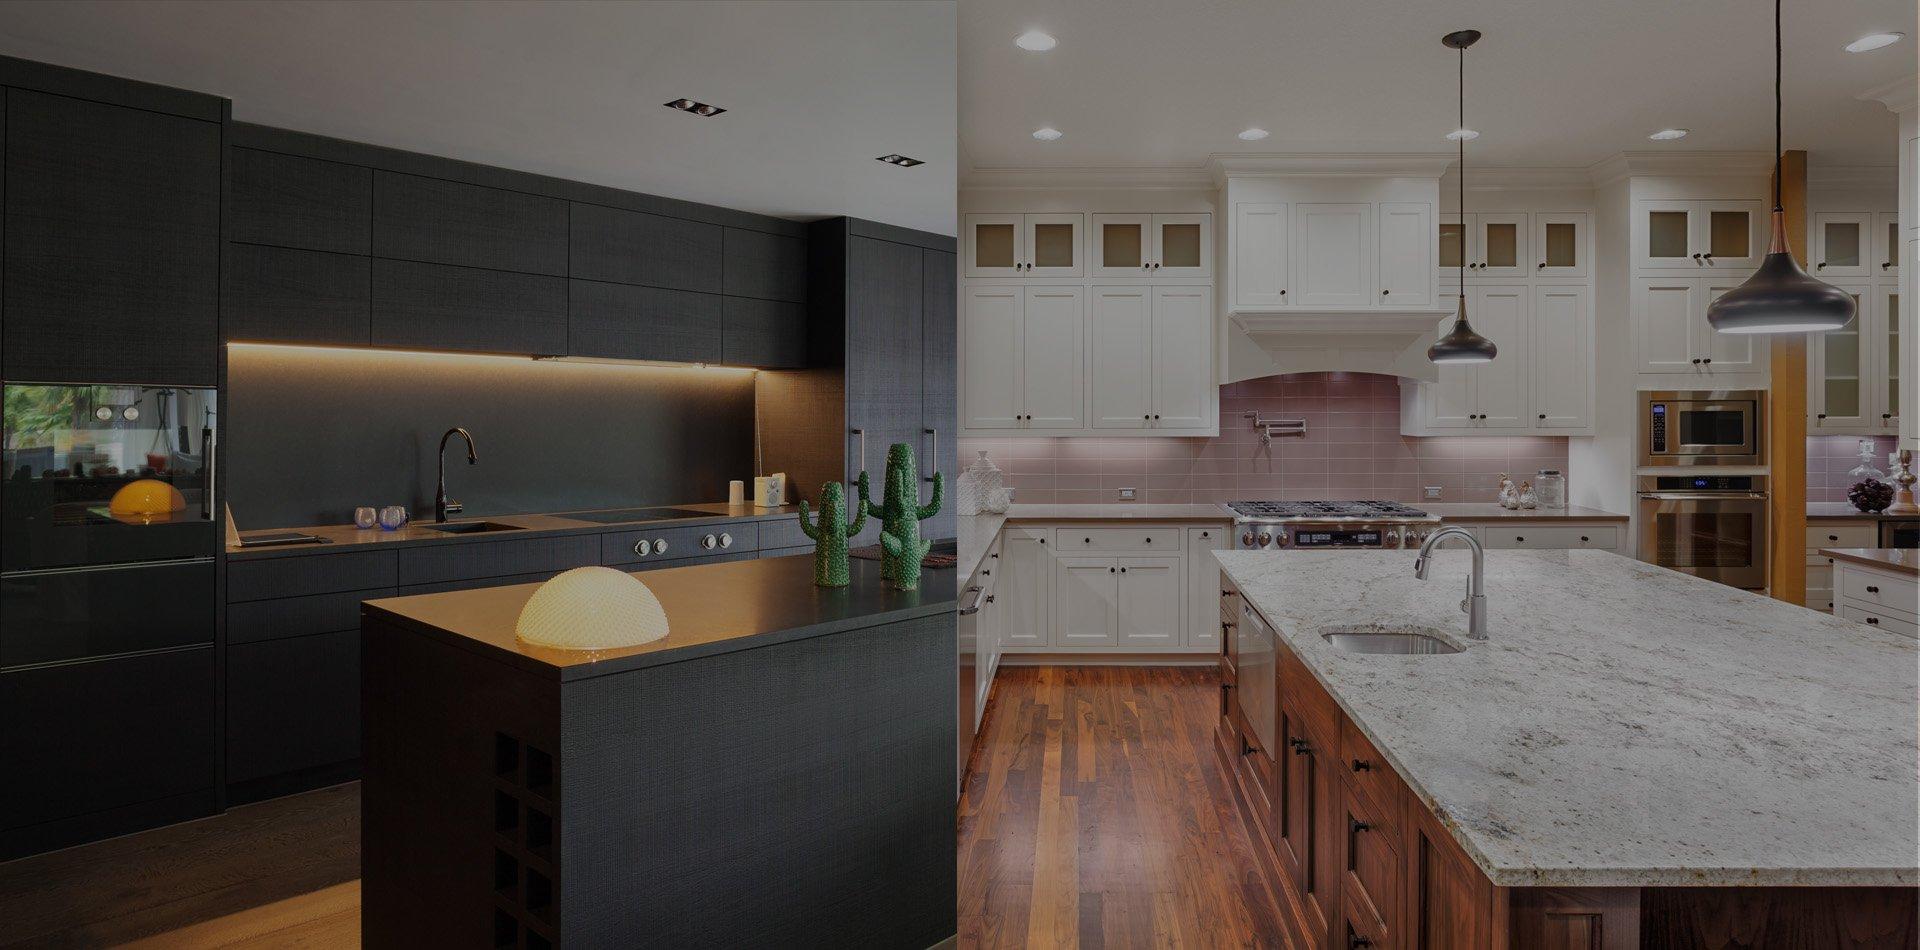 Residential Countertops